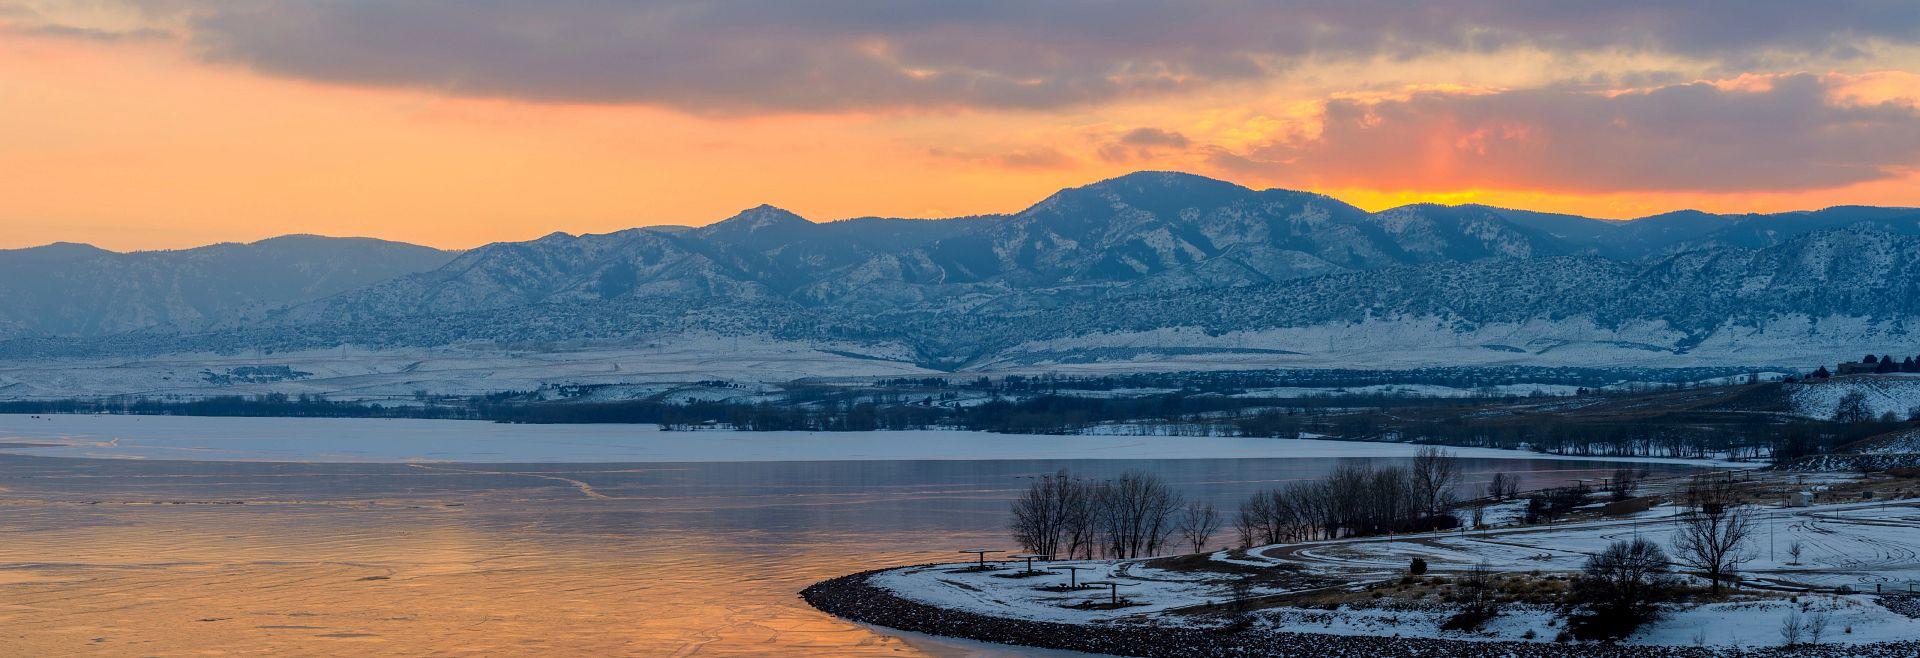 Chatfield State Park Lake Snow Winter Mountains